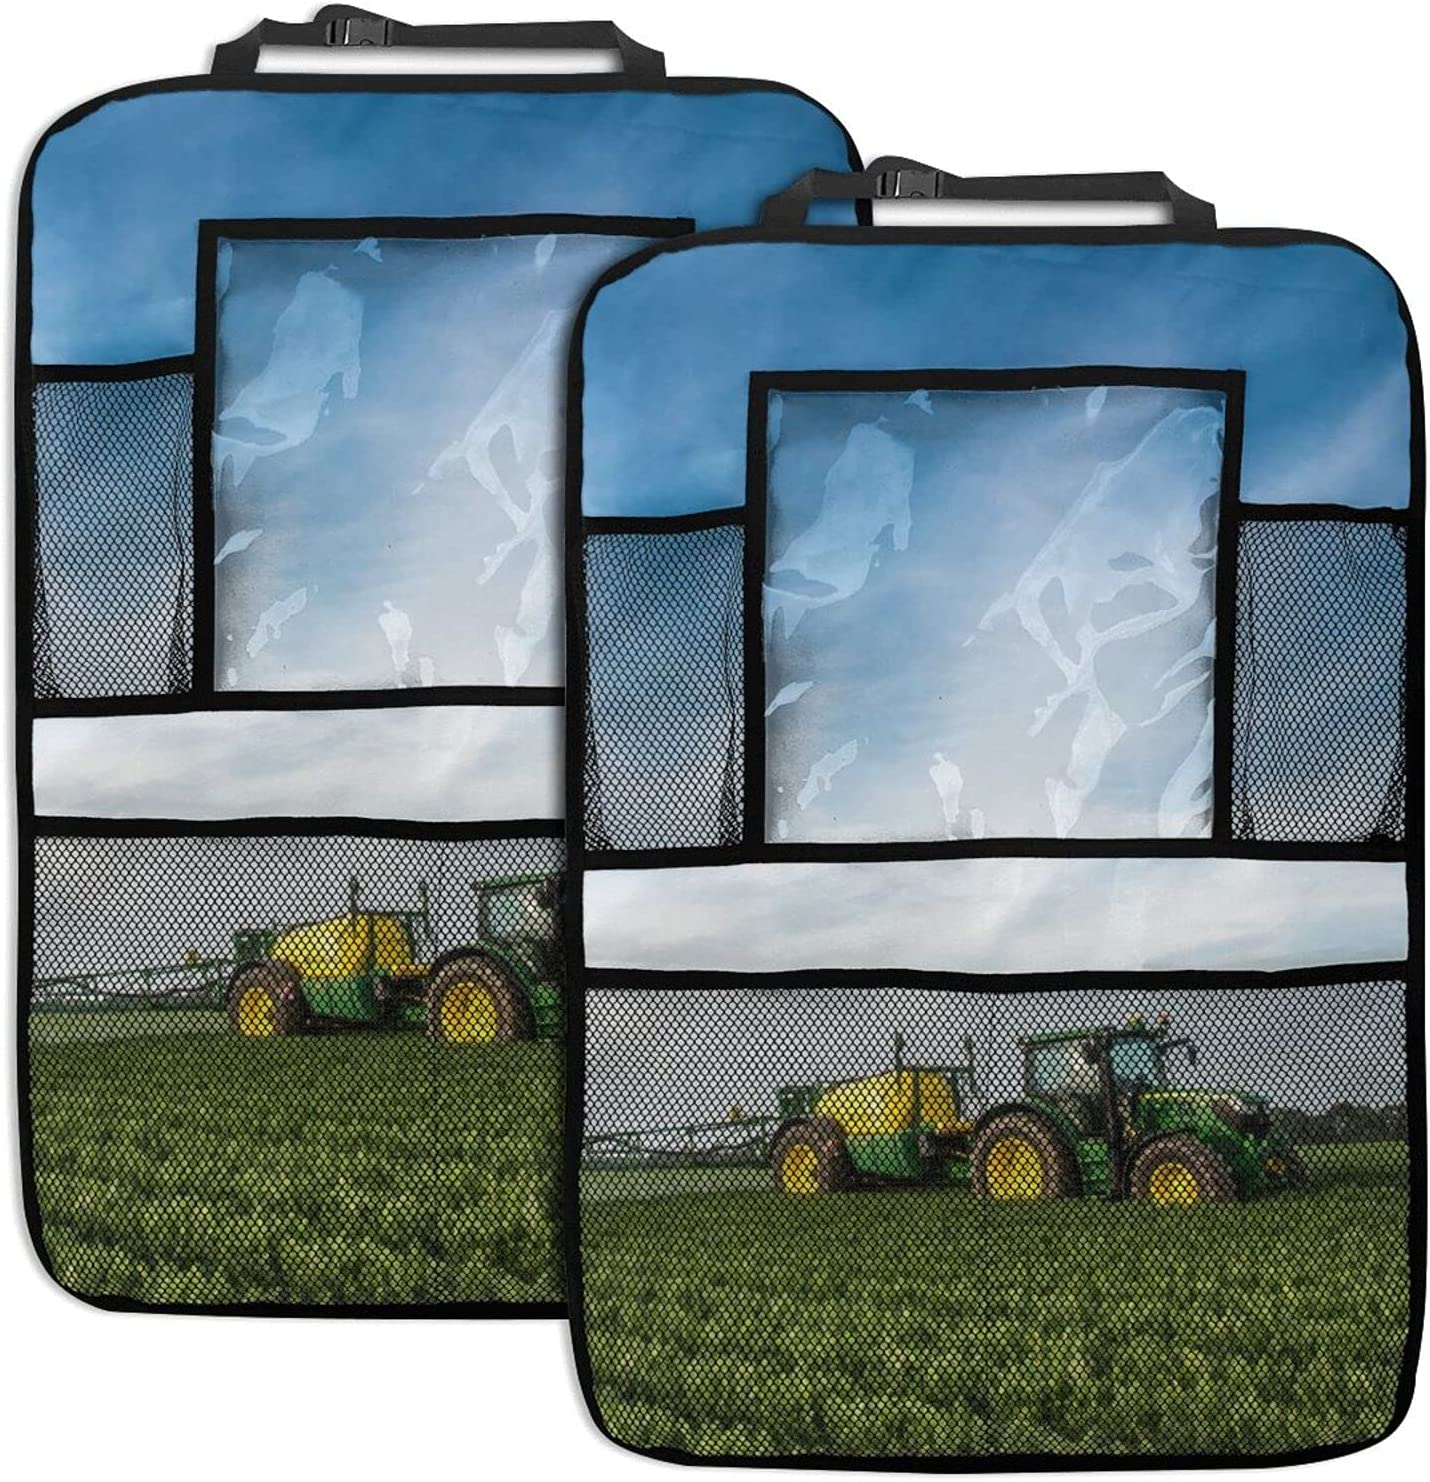 Car Backseat Tulsa Mall Organizer New color Tractor Green B Seat Farmland Print